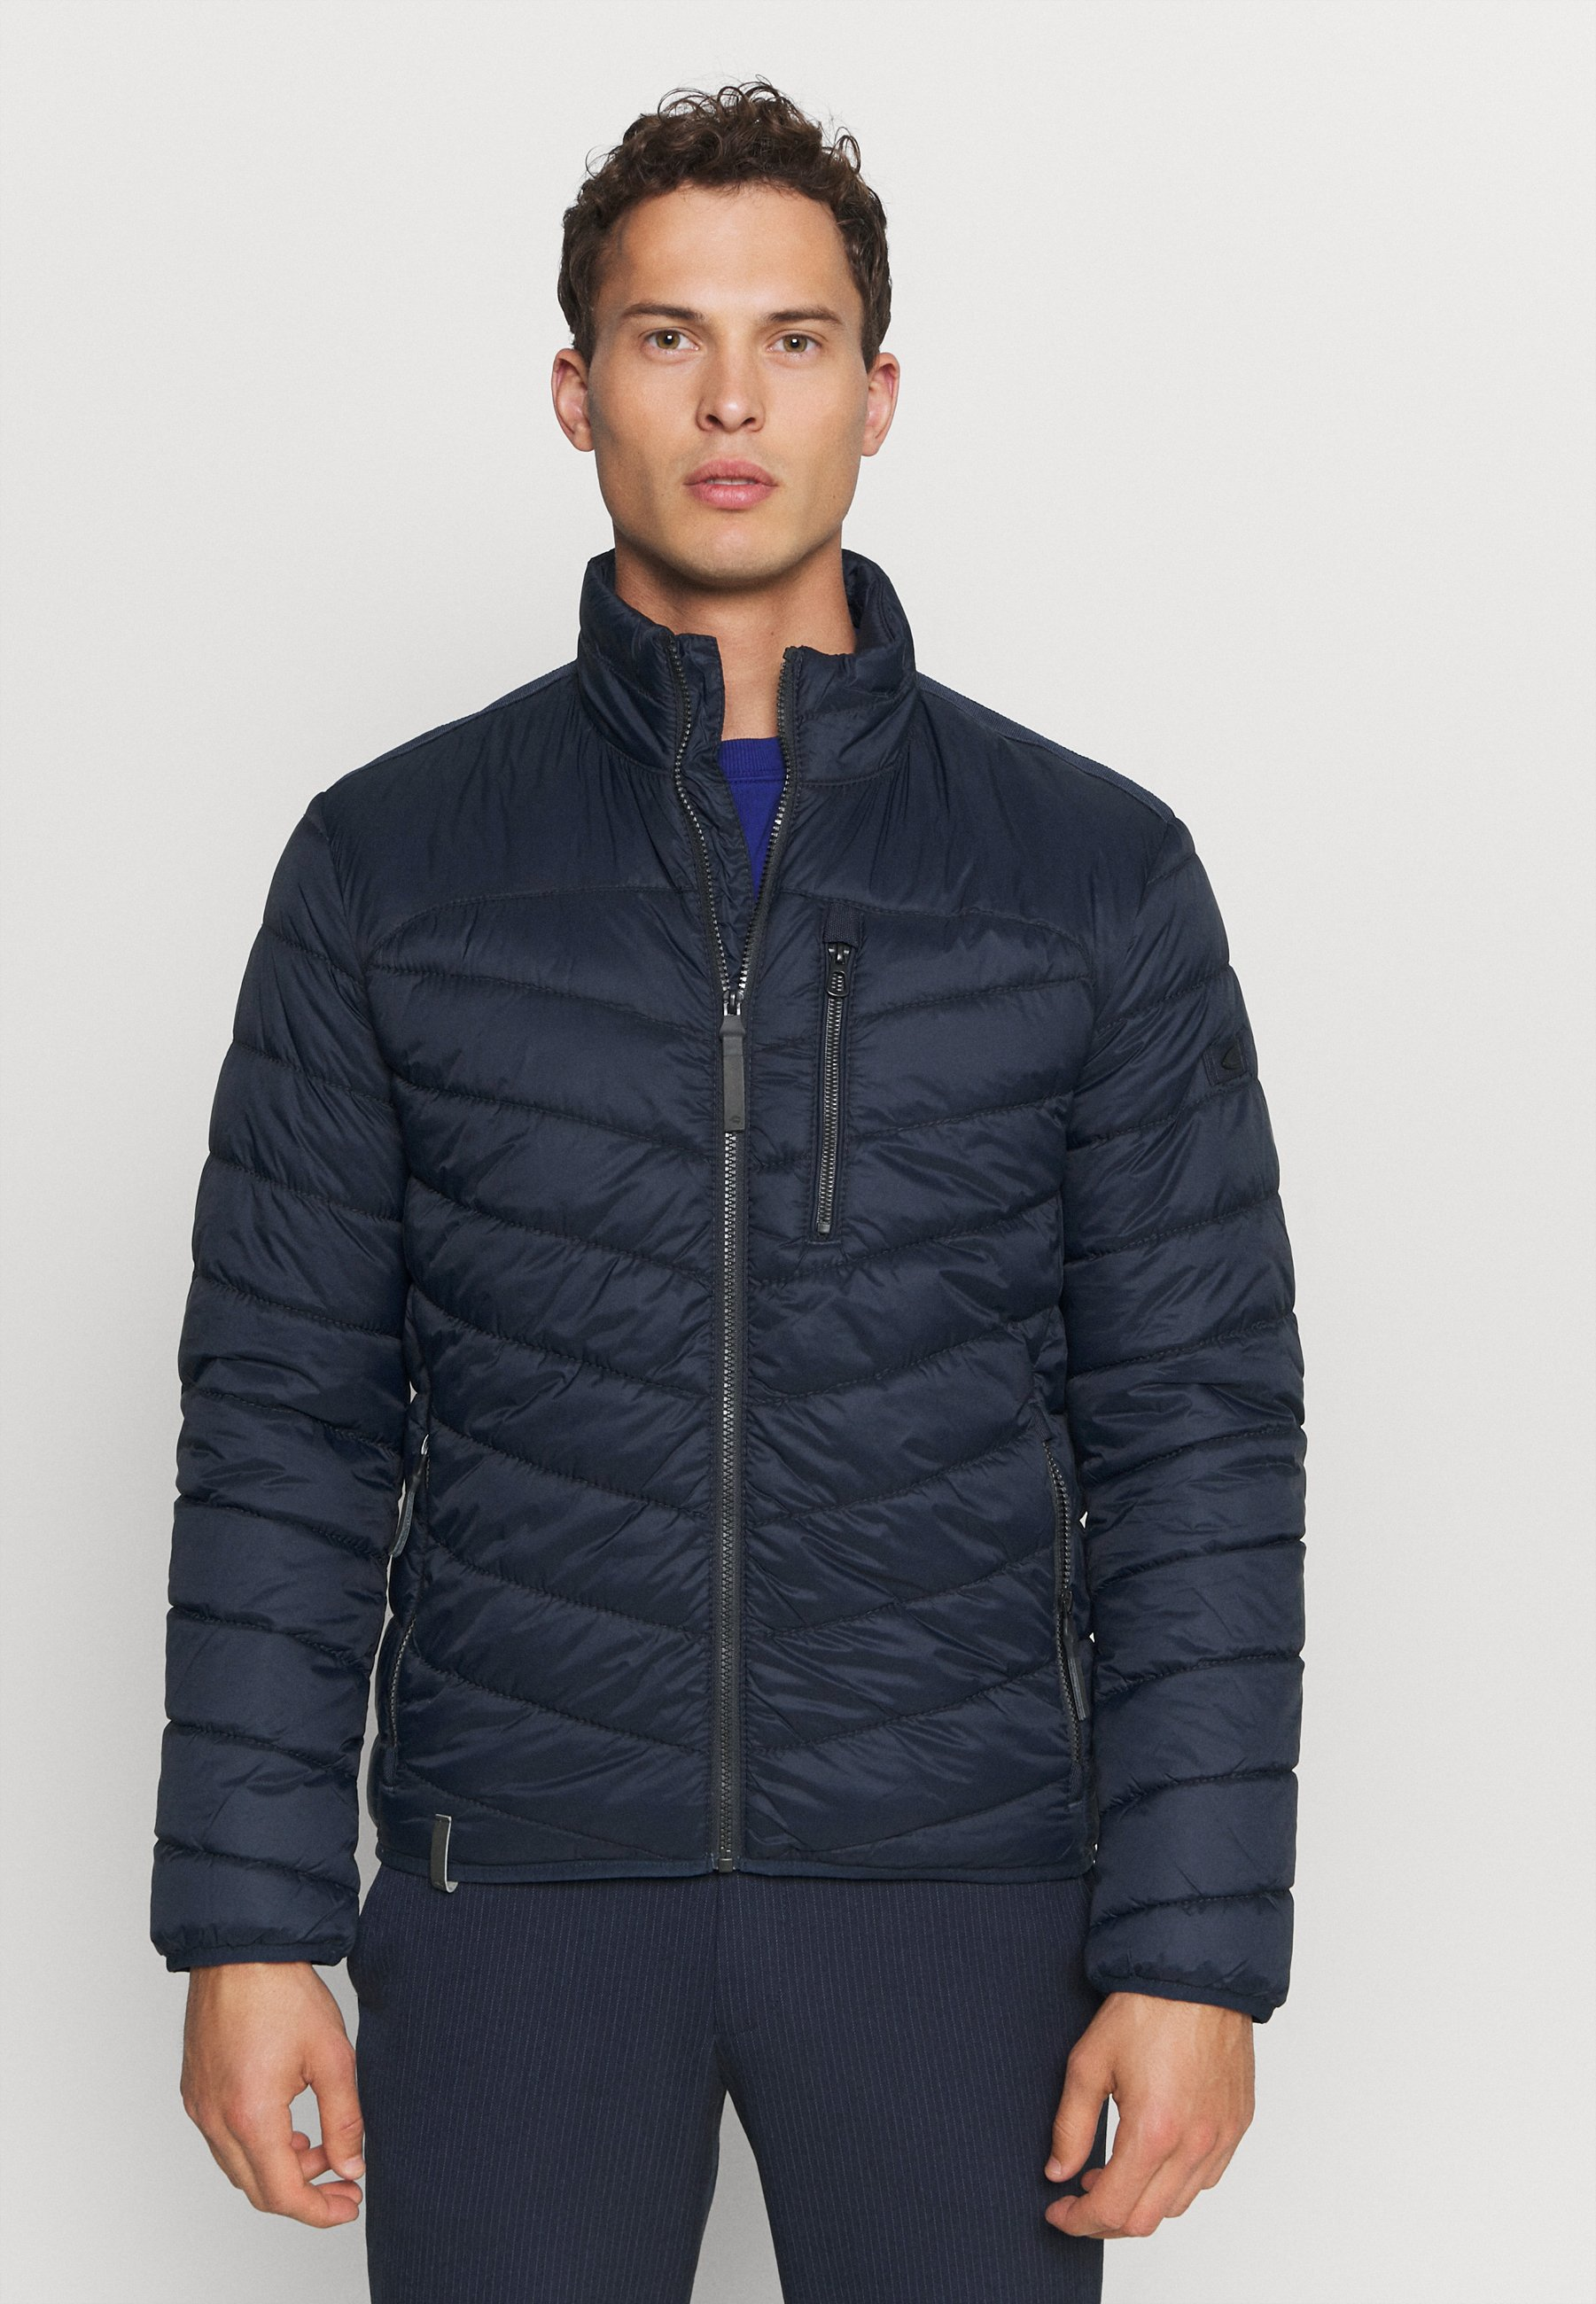 Clearance Wholesale camel active Light jacket - navy | men's clothing 2020 GwlXa